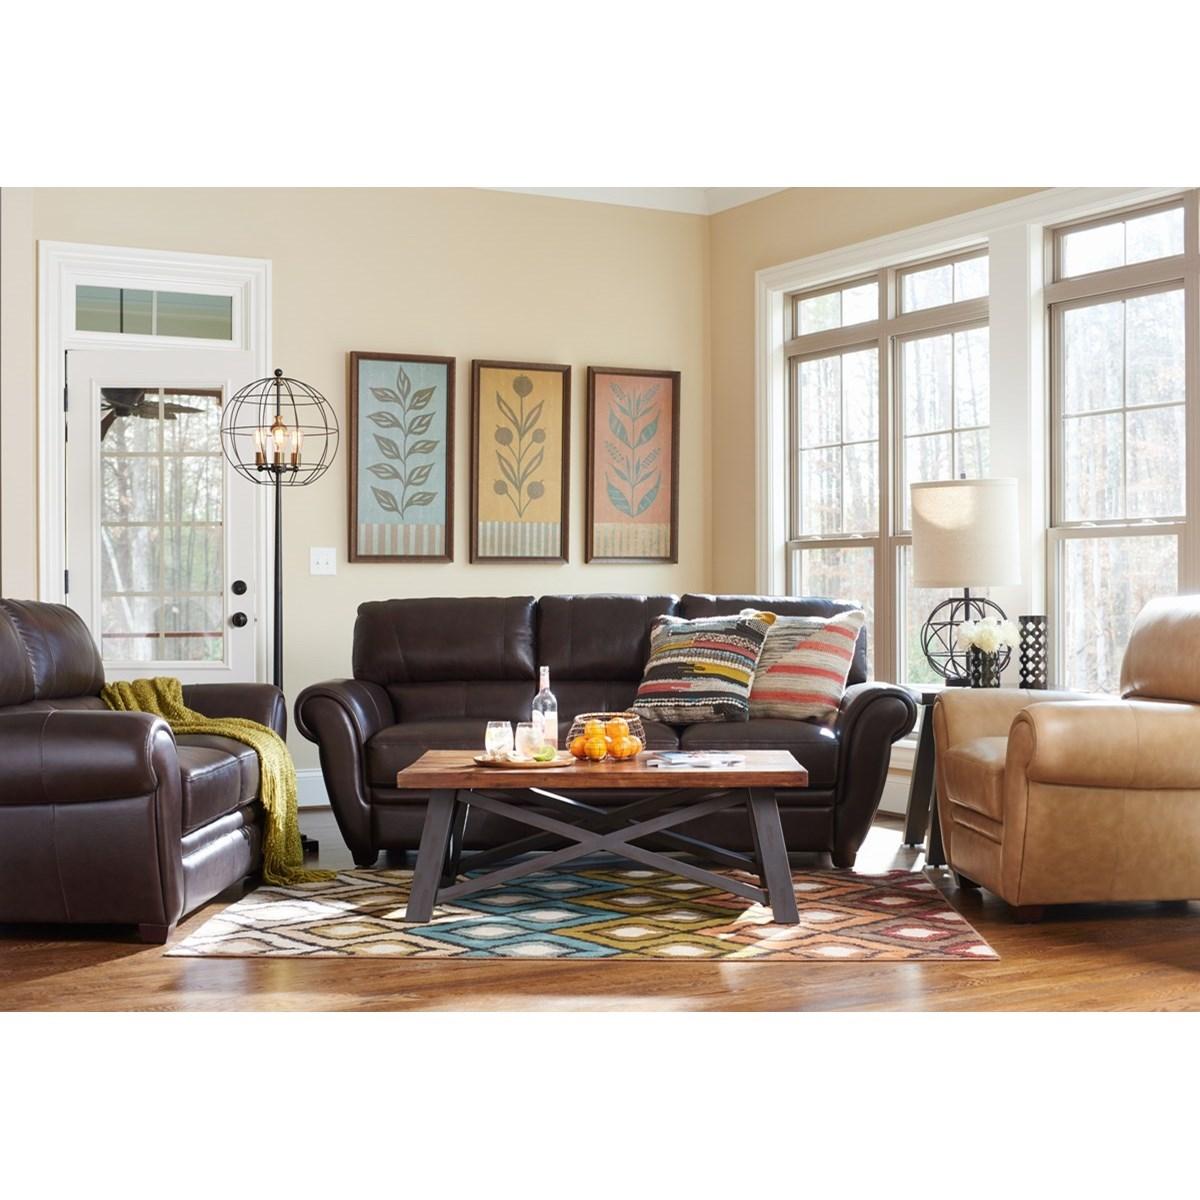 La z boy nitro living room group knight furniture for La z boy living room set